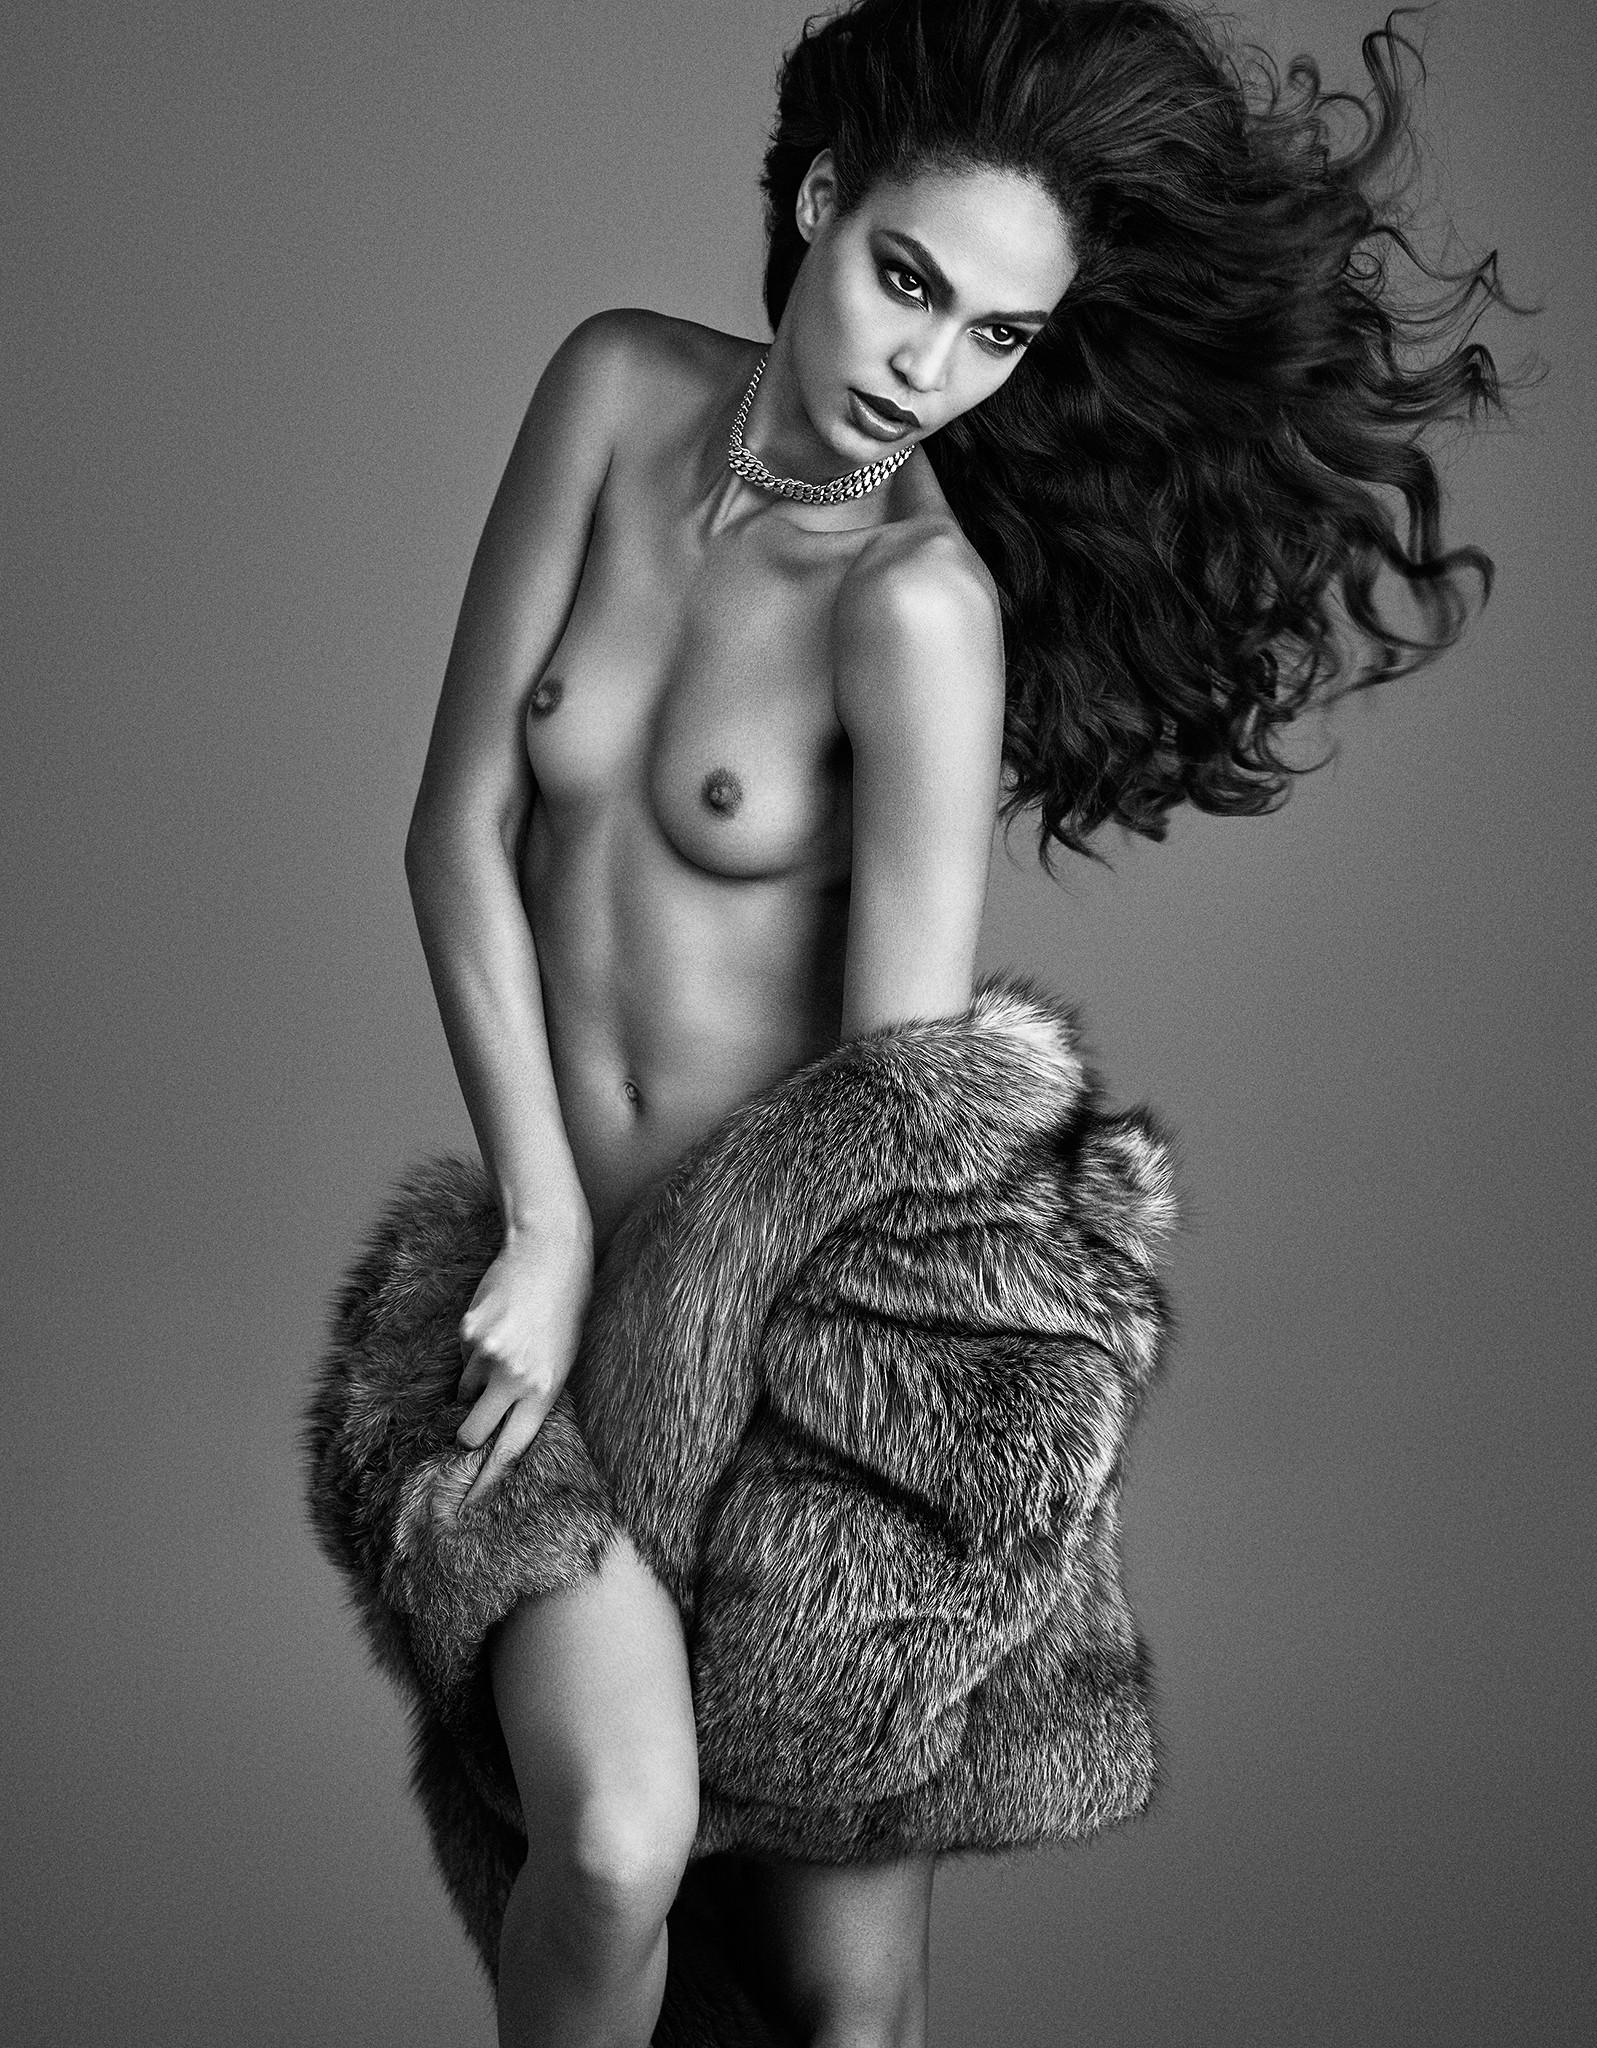 joan-smalls-topless-for-lui-magazine-september-2015-02